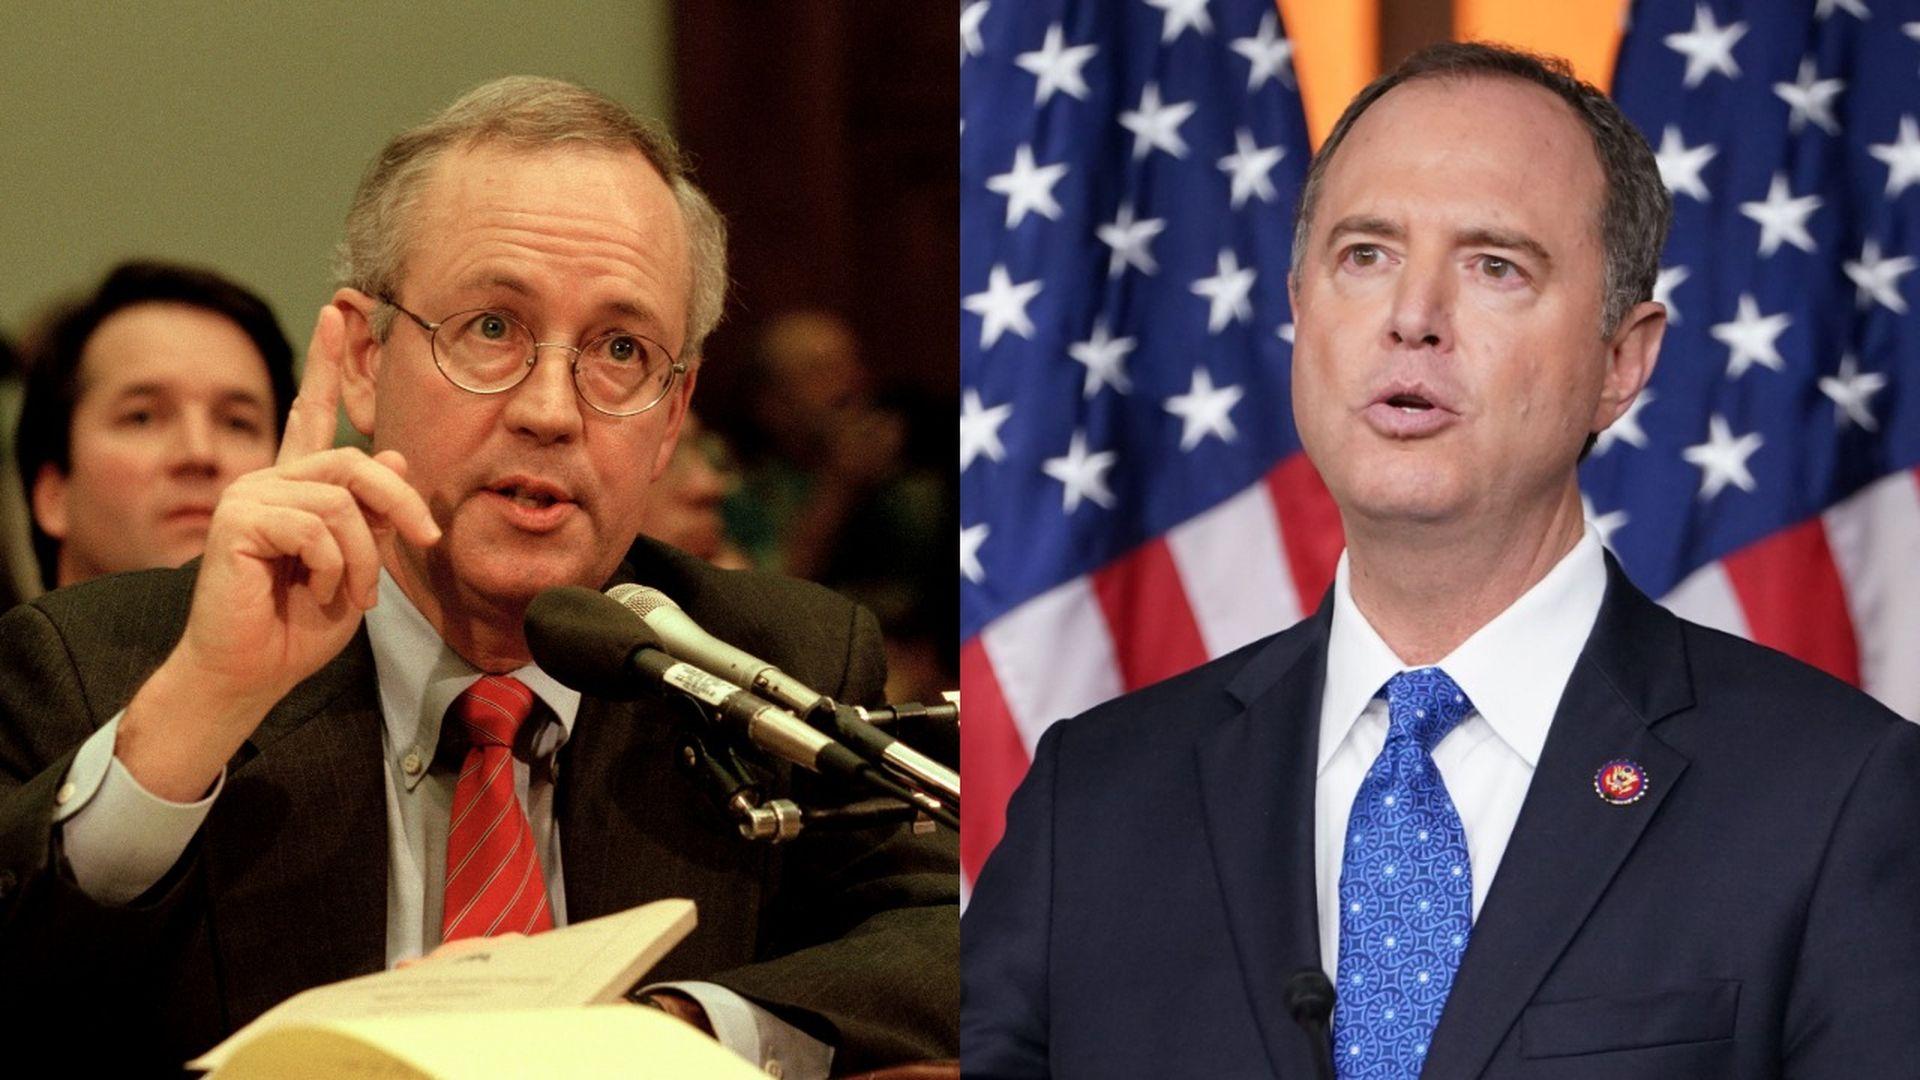 Adam Schiff is Democrats' Ken Starr in the Trump impeachment inquiry